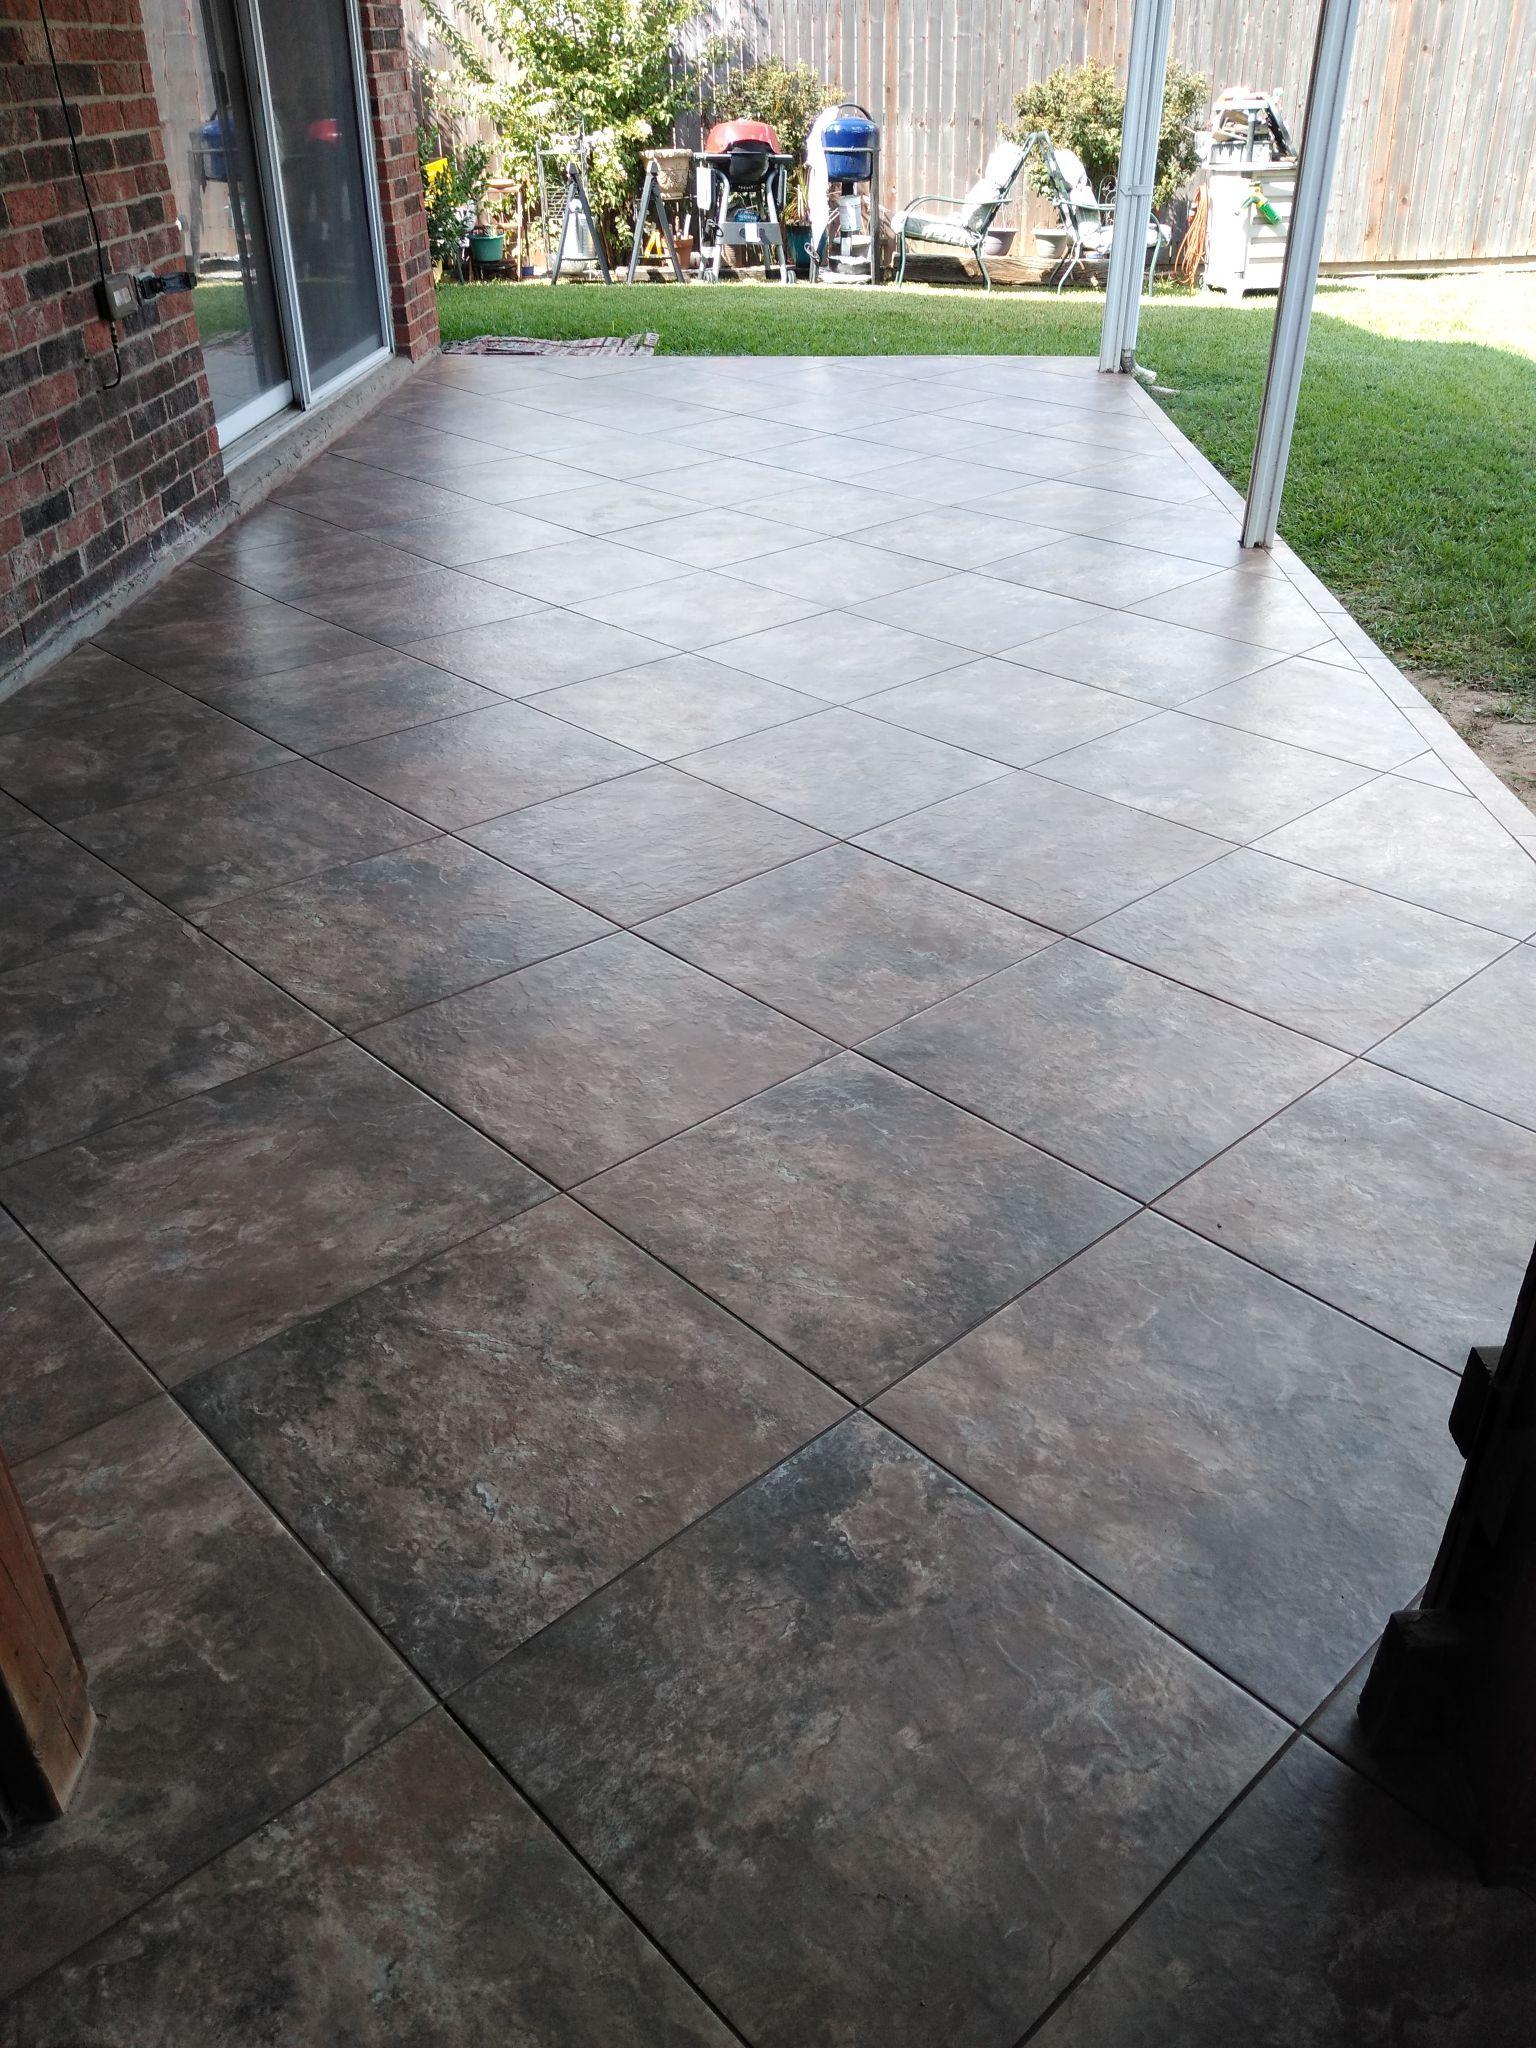 Arko 20x20 Porcelain Tile Laid On The Diagonal On A Back Porch